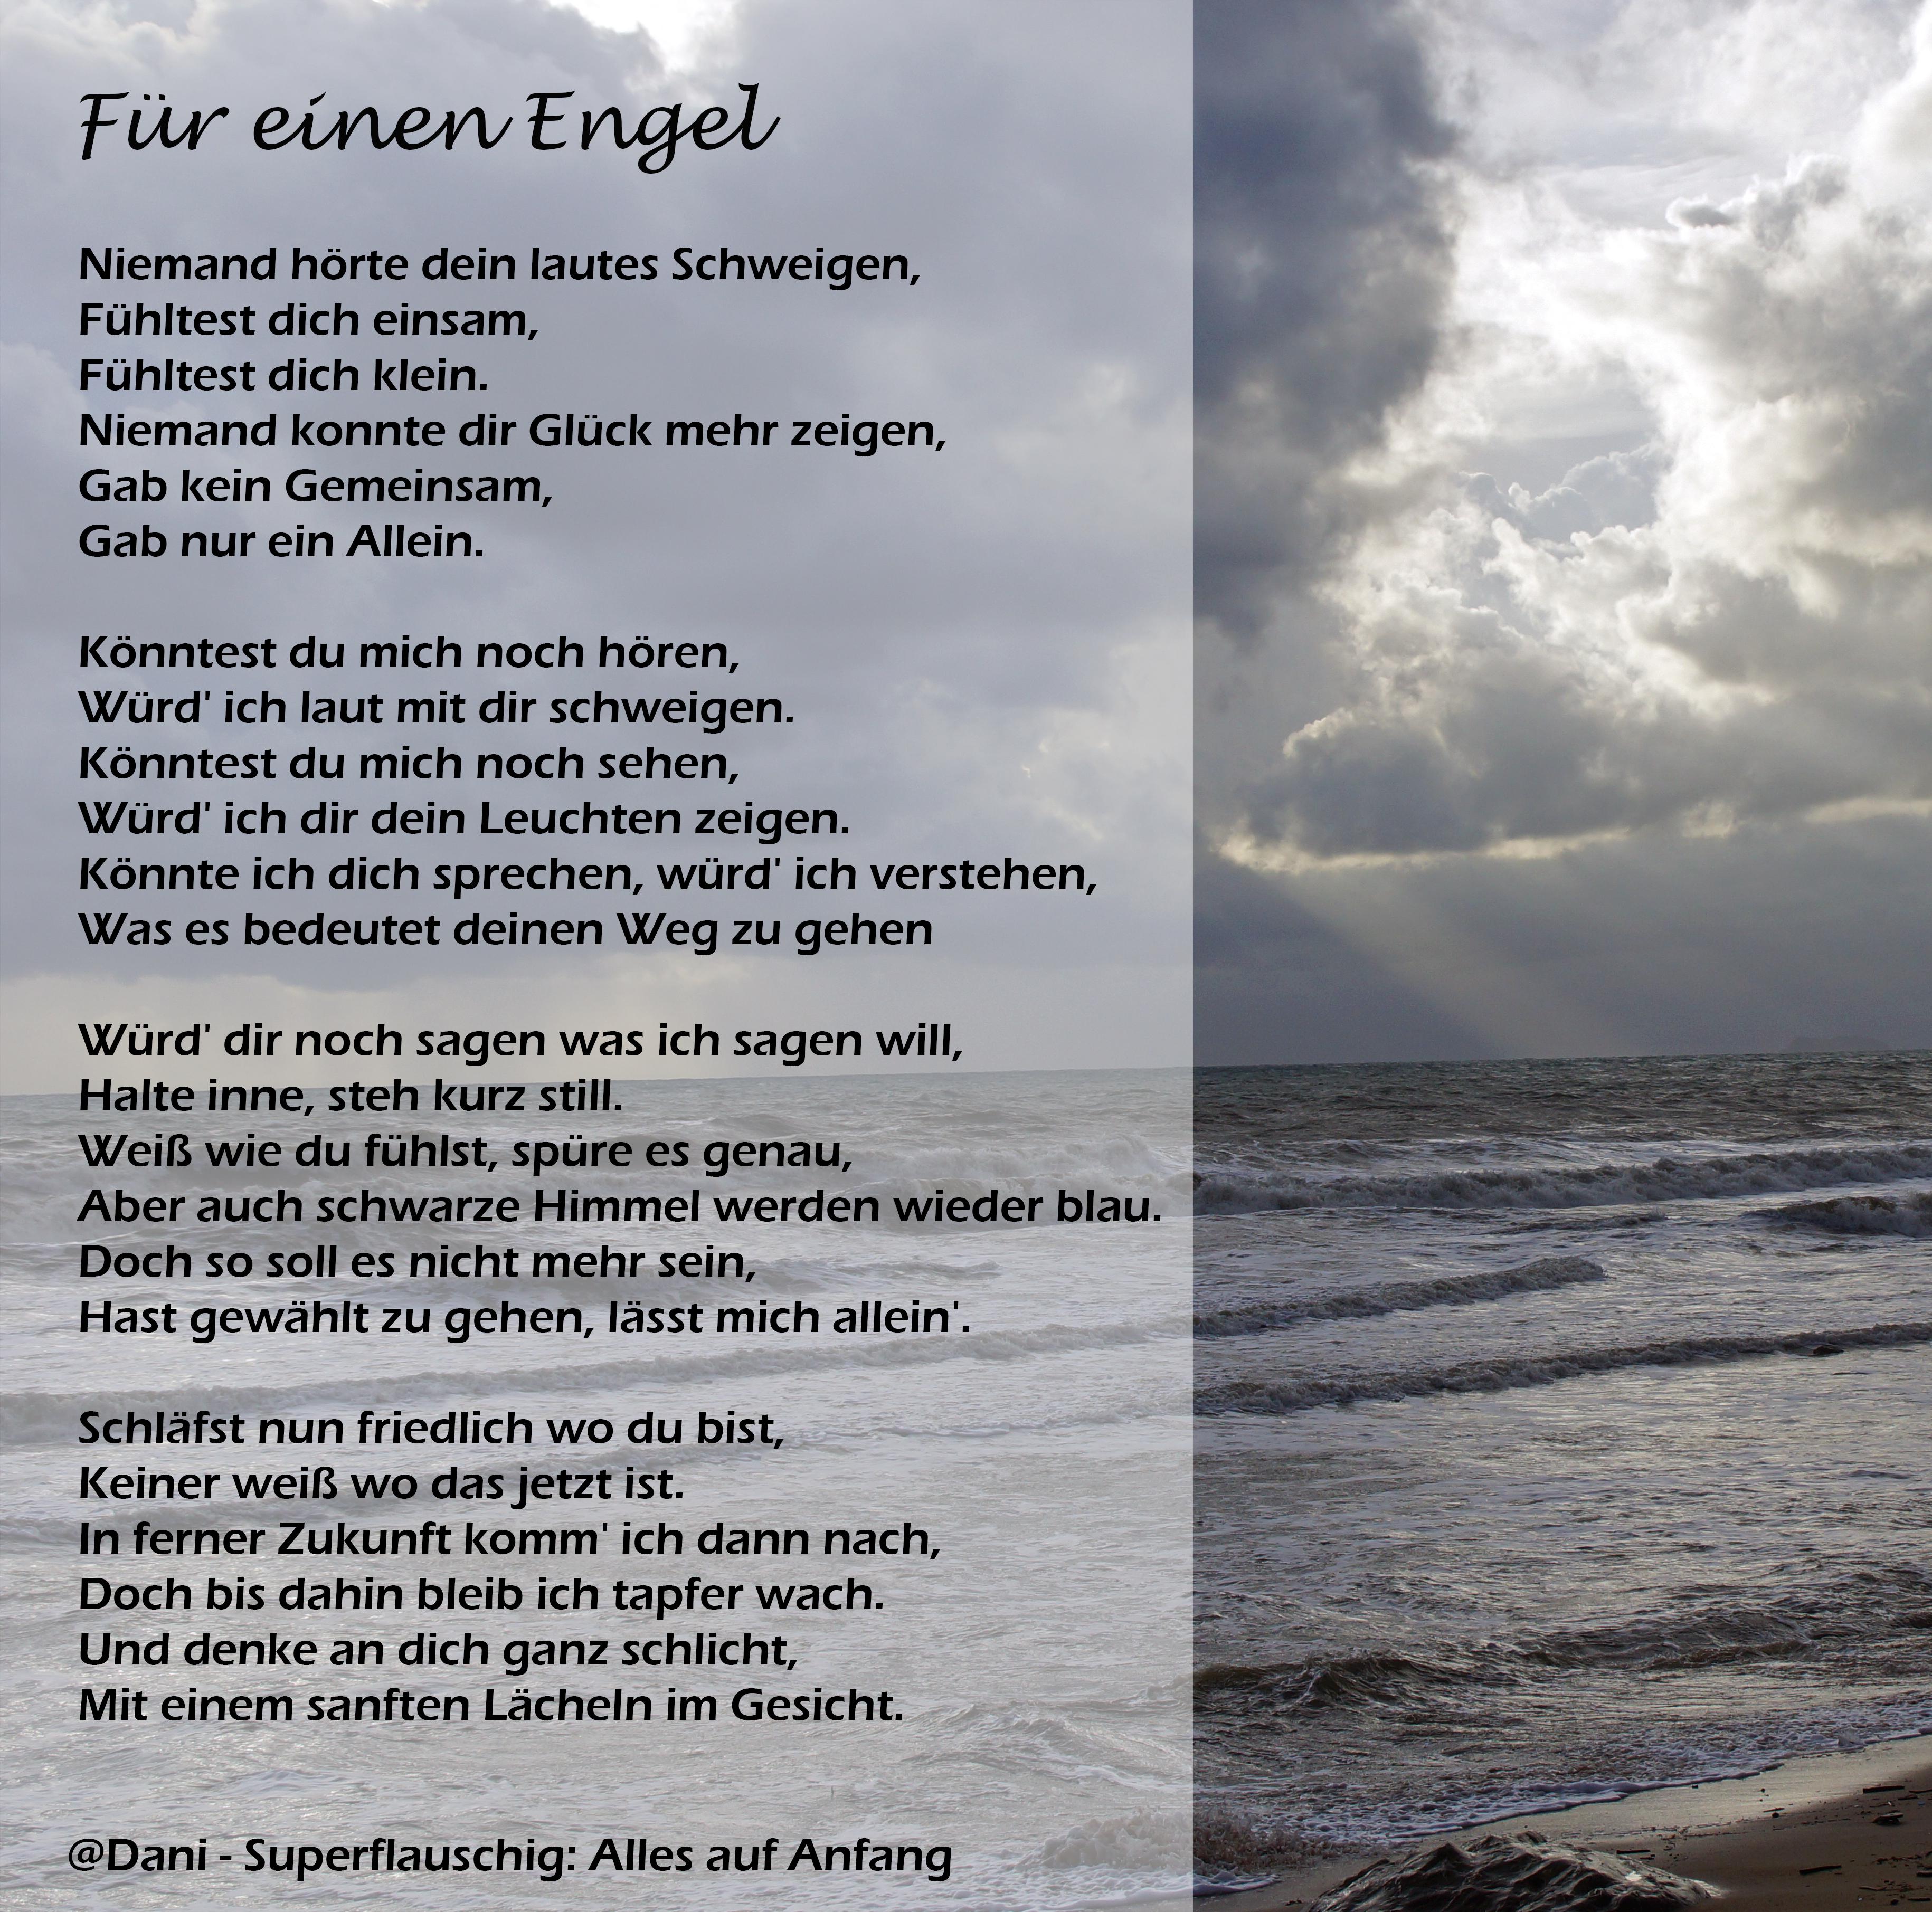 Gedichte uber engel tod